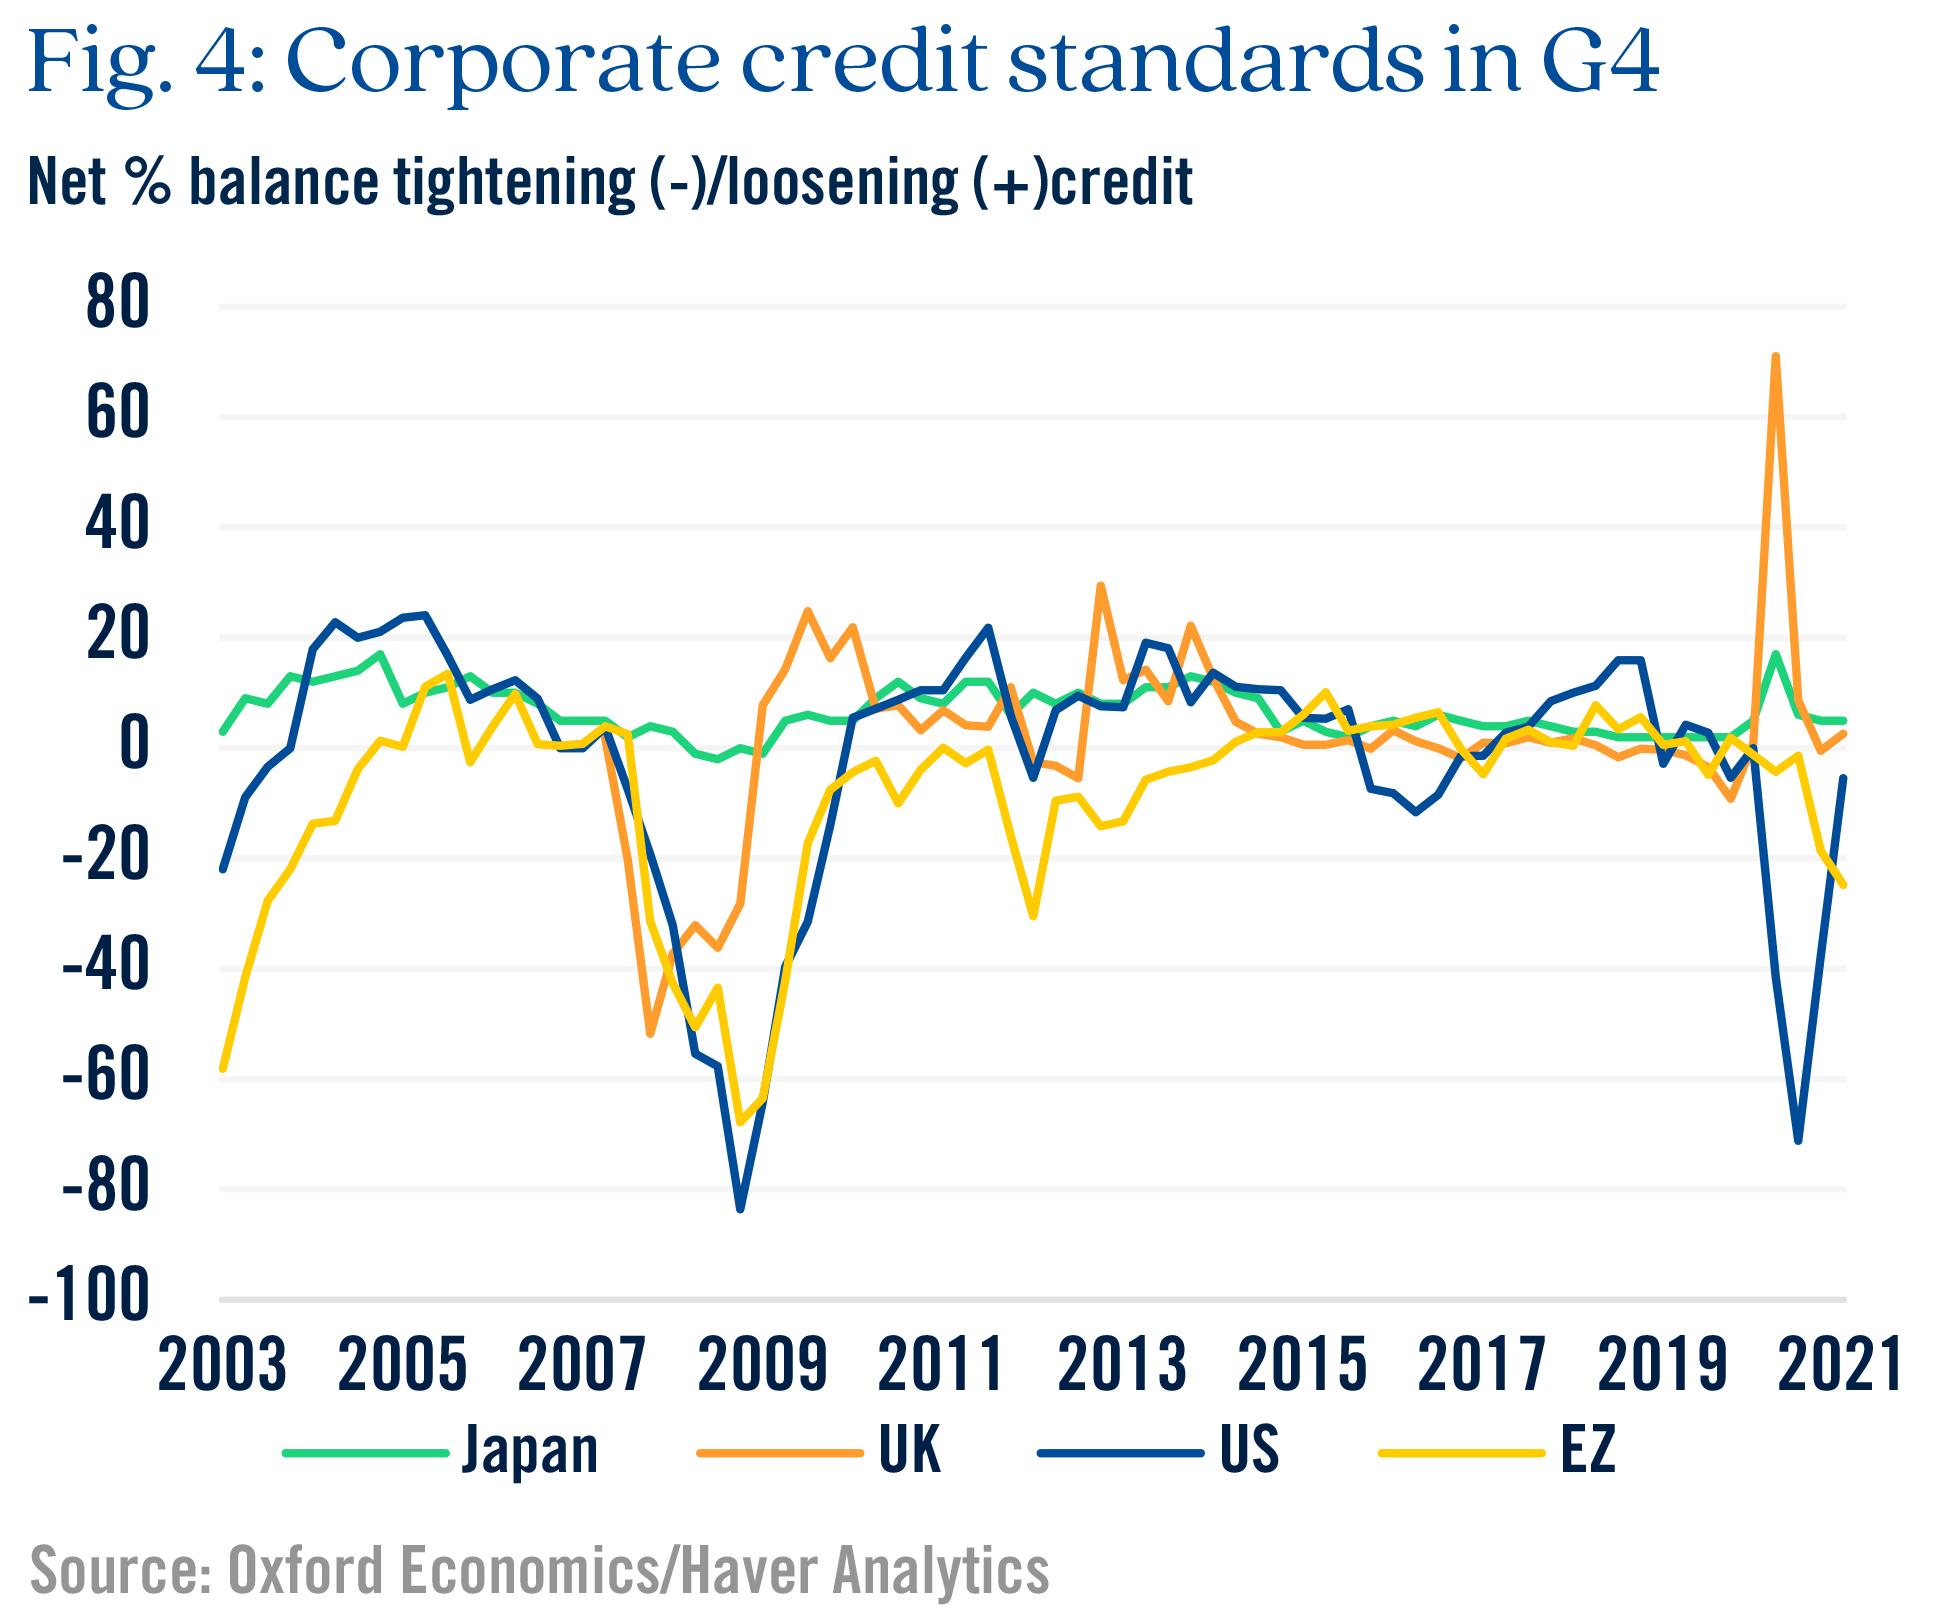 Figure 4 corporate credit standards in G4